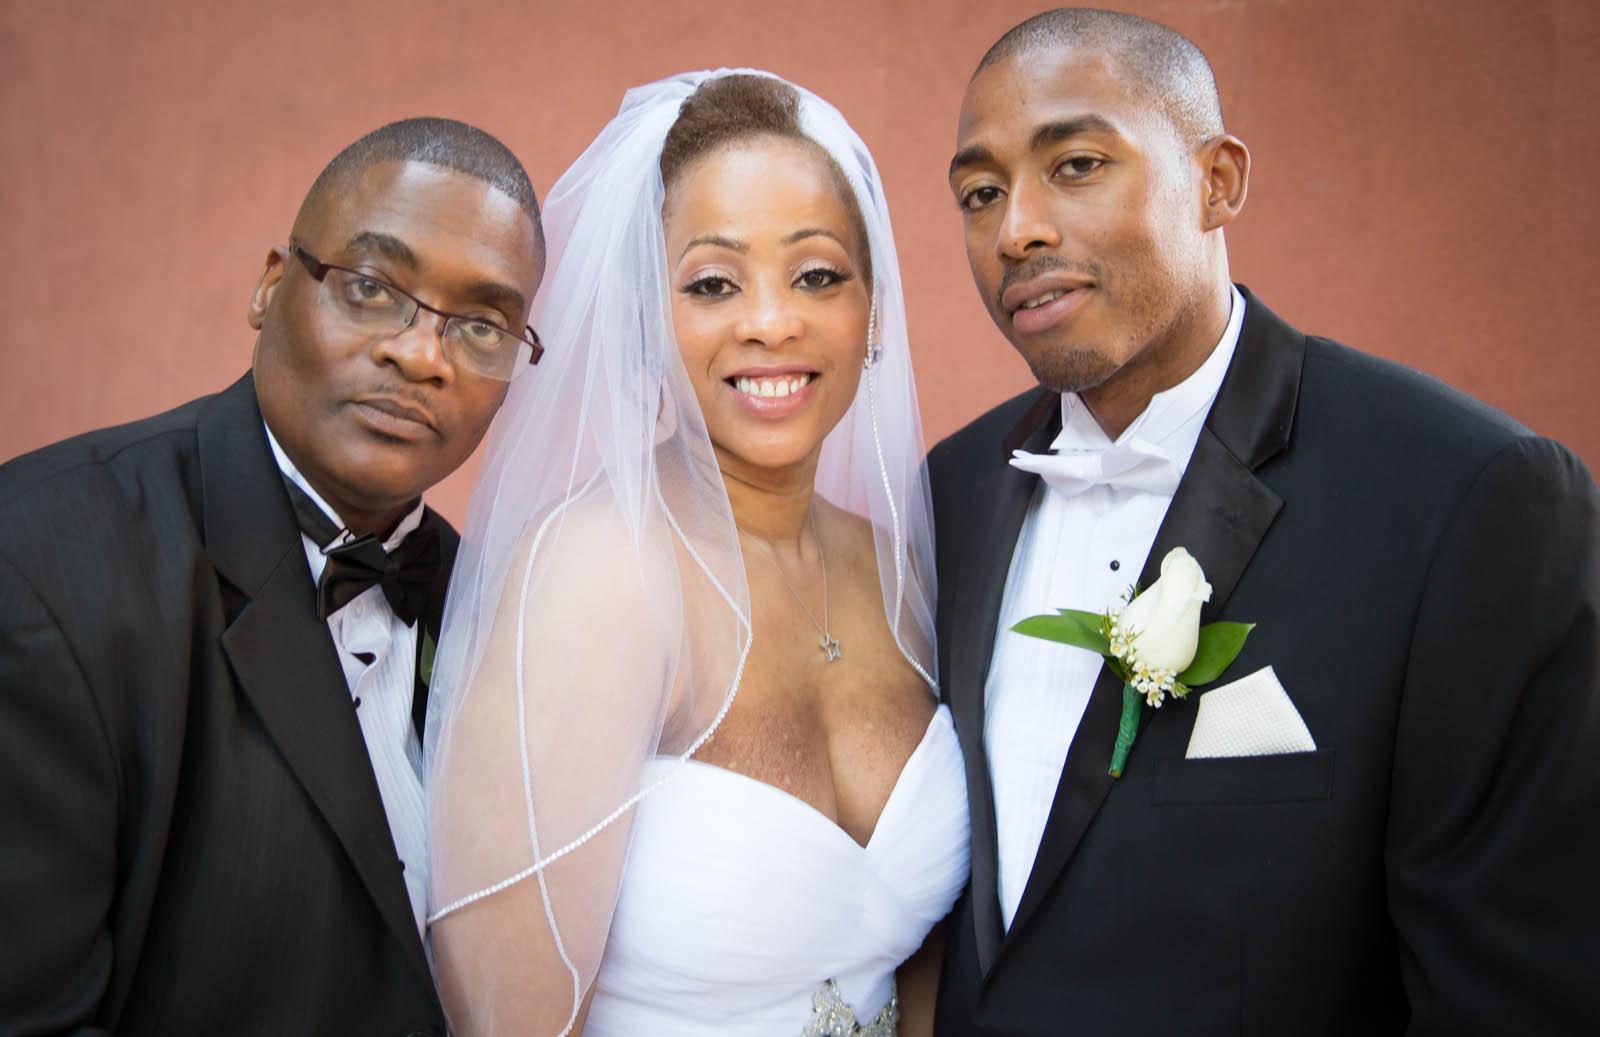 Malik_and_Shanika_Wedding_Ernestosue-9127.jpg